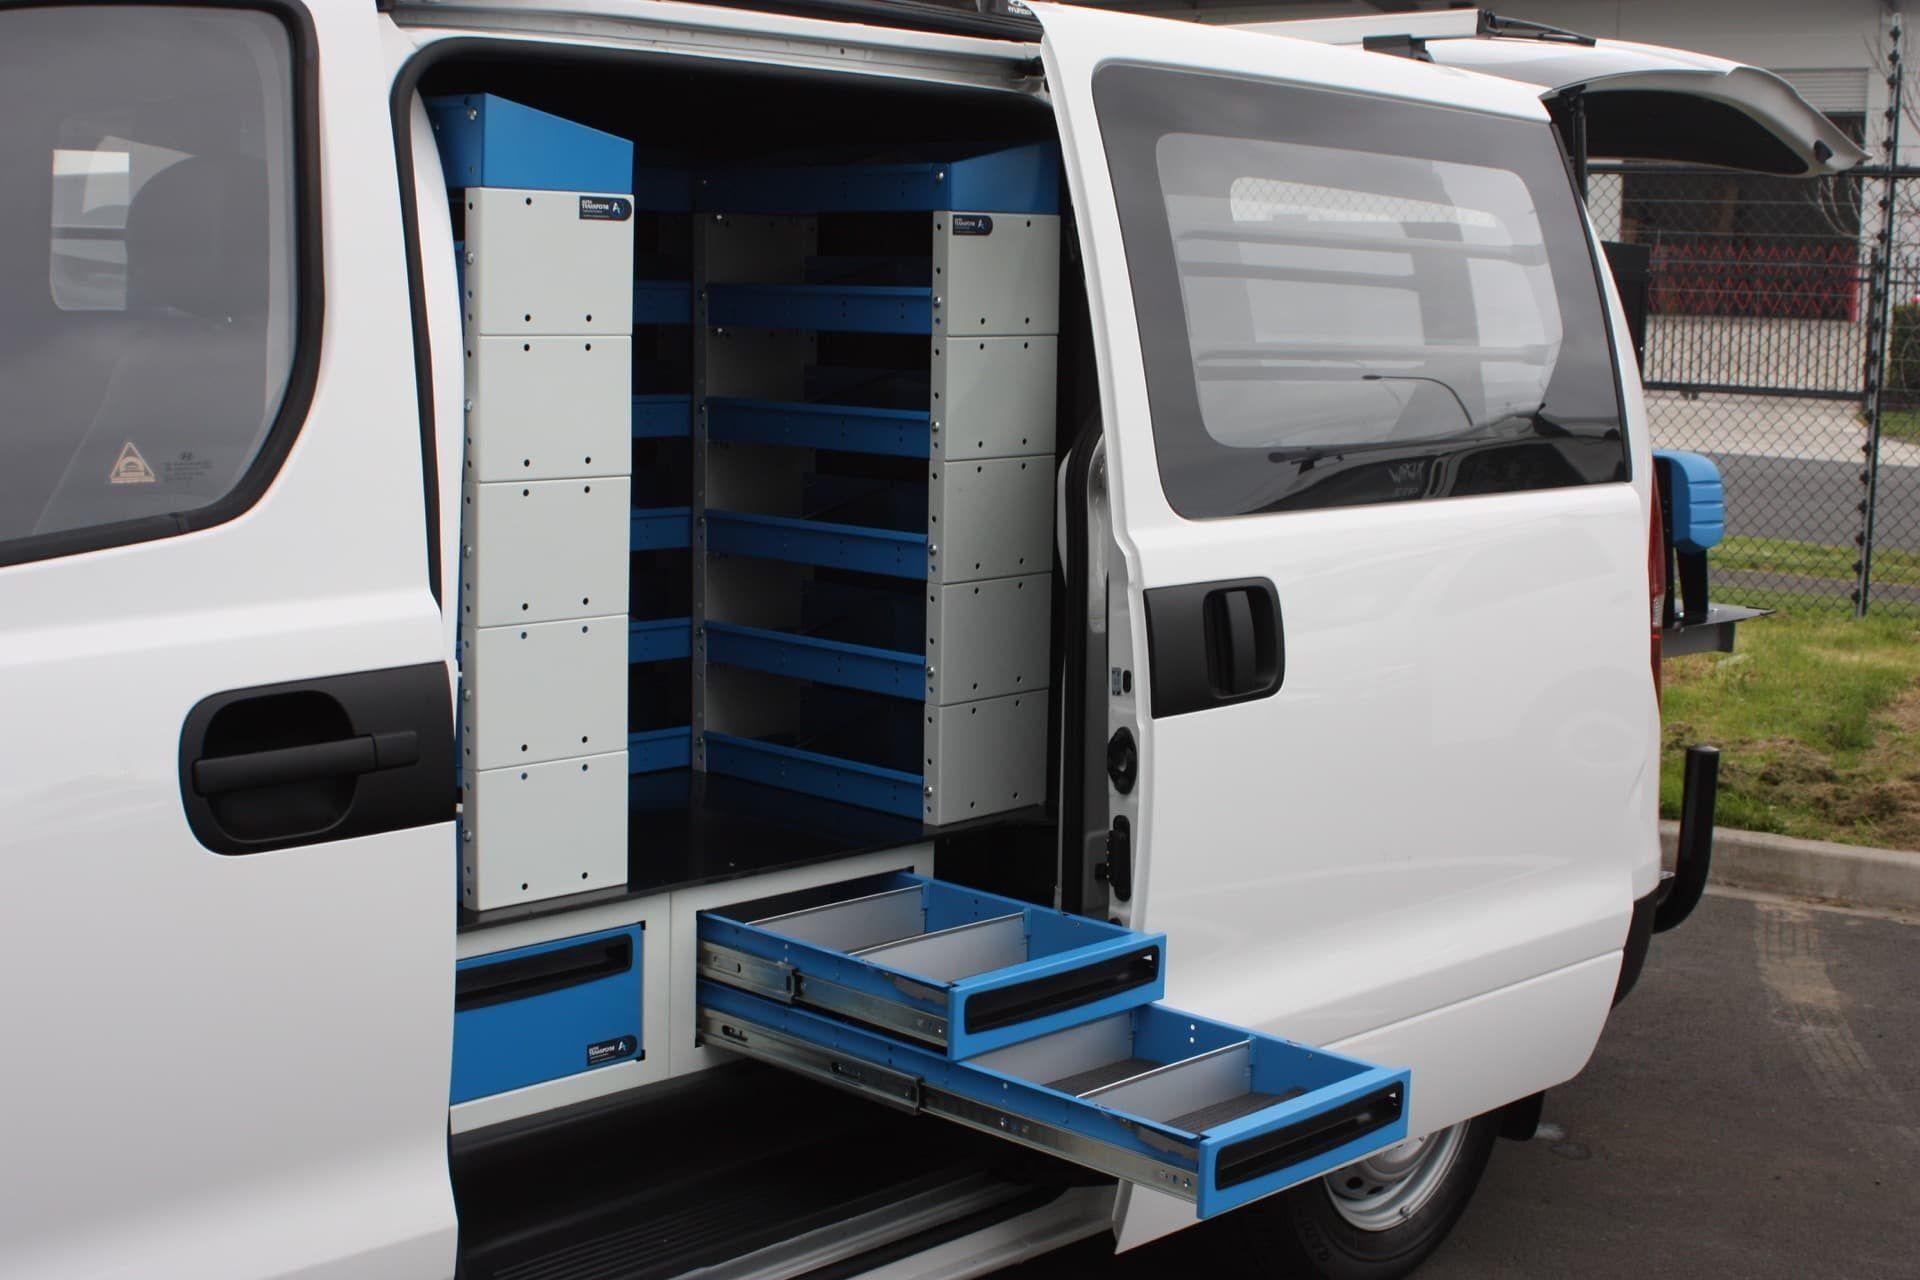 Custom vehicle interior with tool drawers